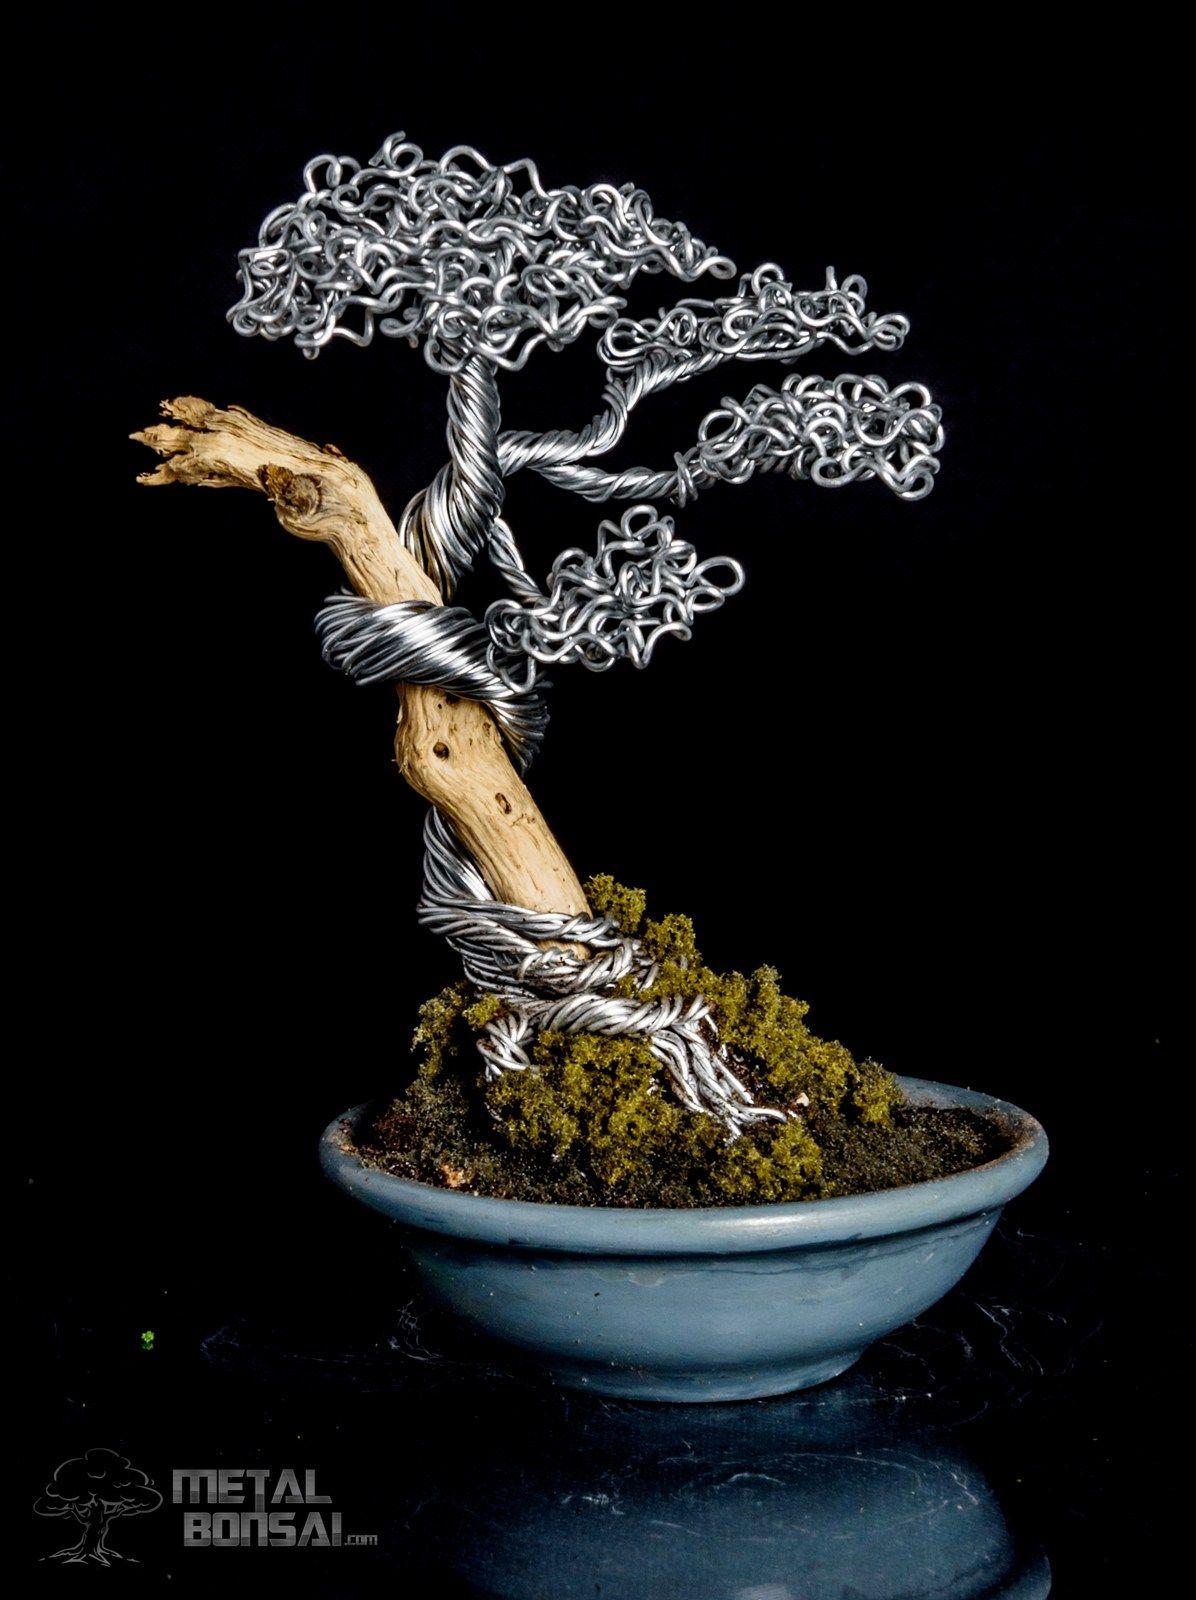 Metal Bonsai Tree Art Sculpture. Wire bonsai tree sculpture ...